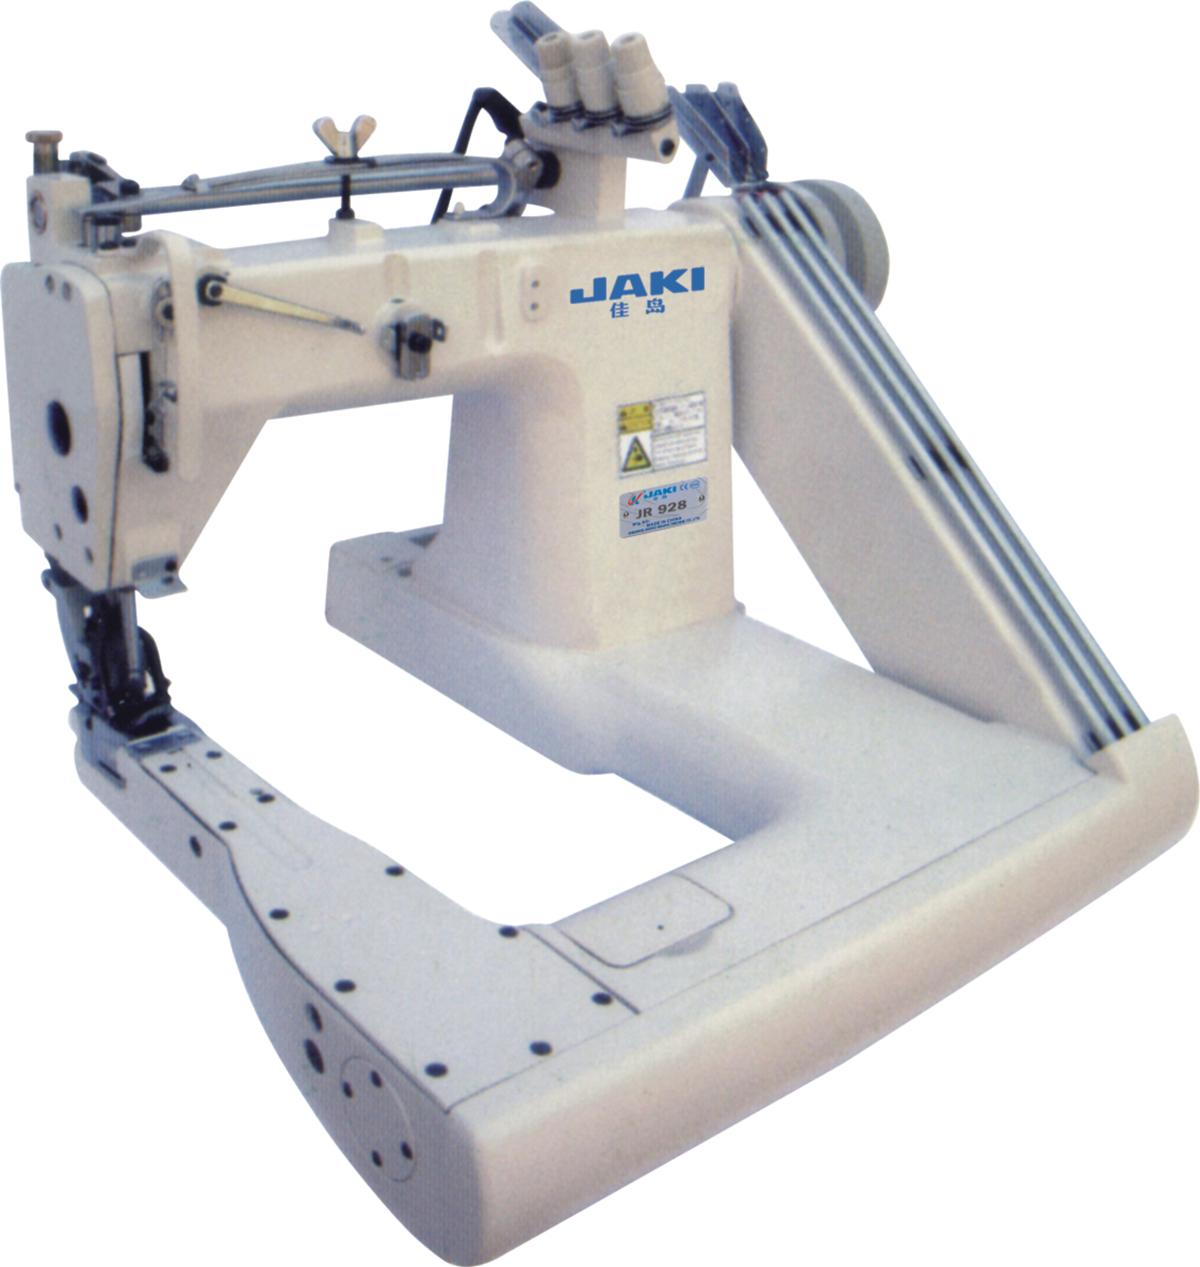 JR928